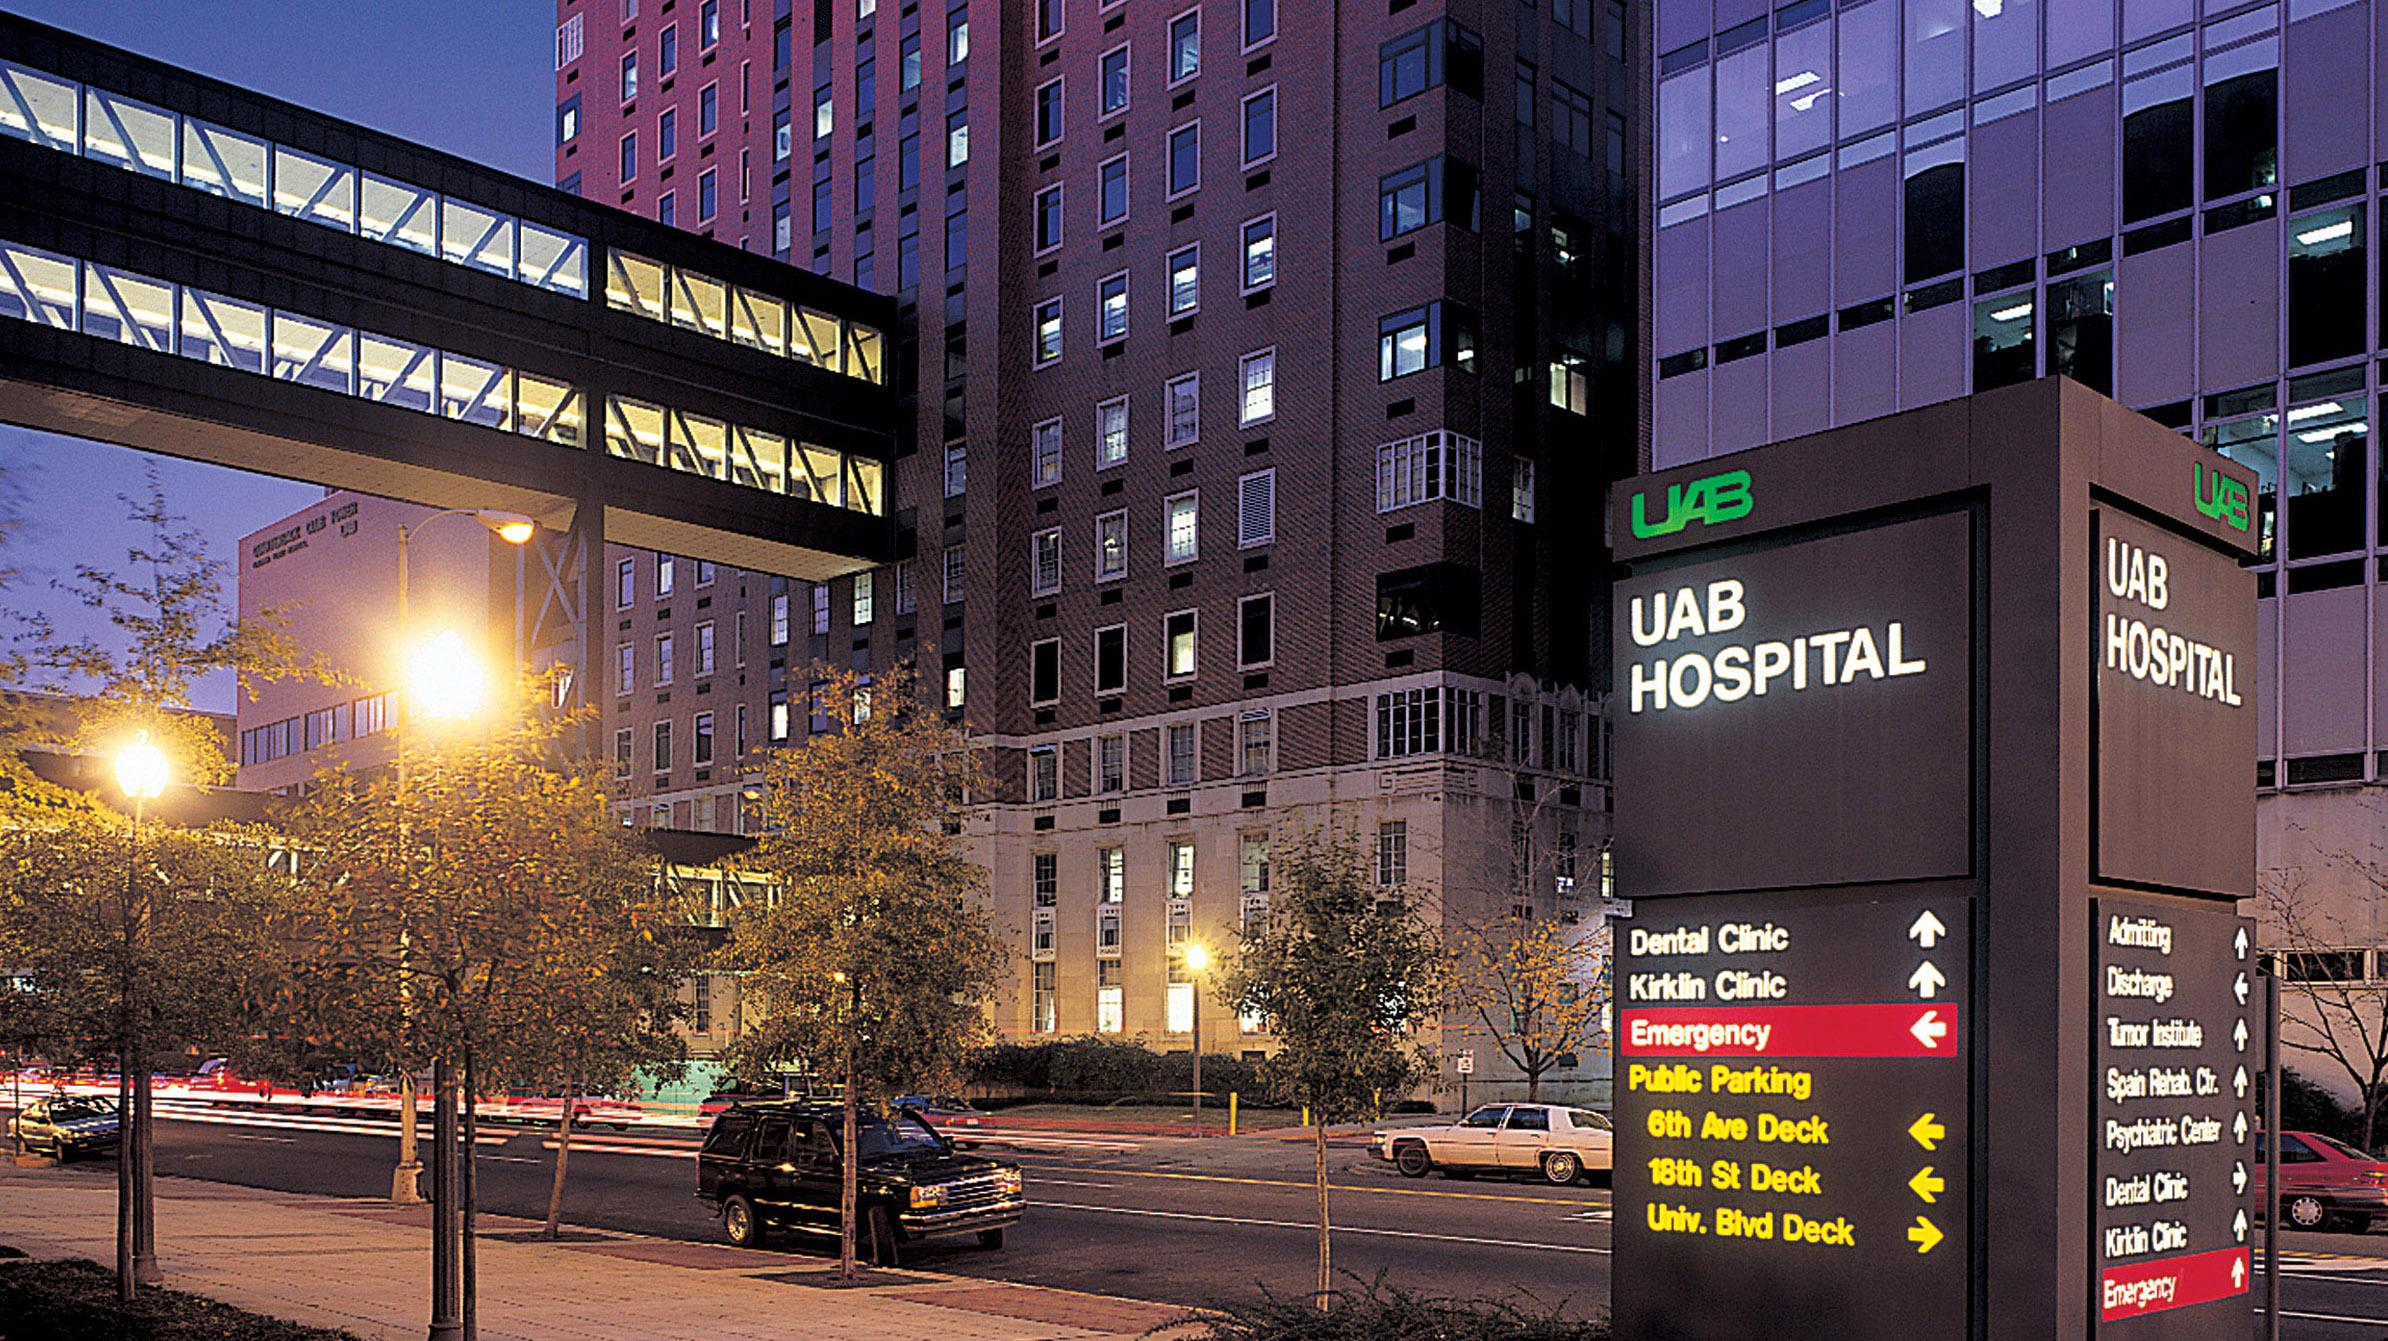 UAB Medicine Jefferson Tower exterior view at night